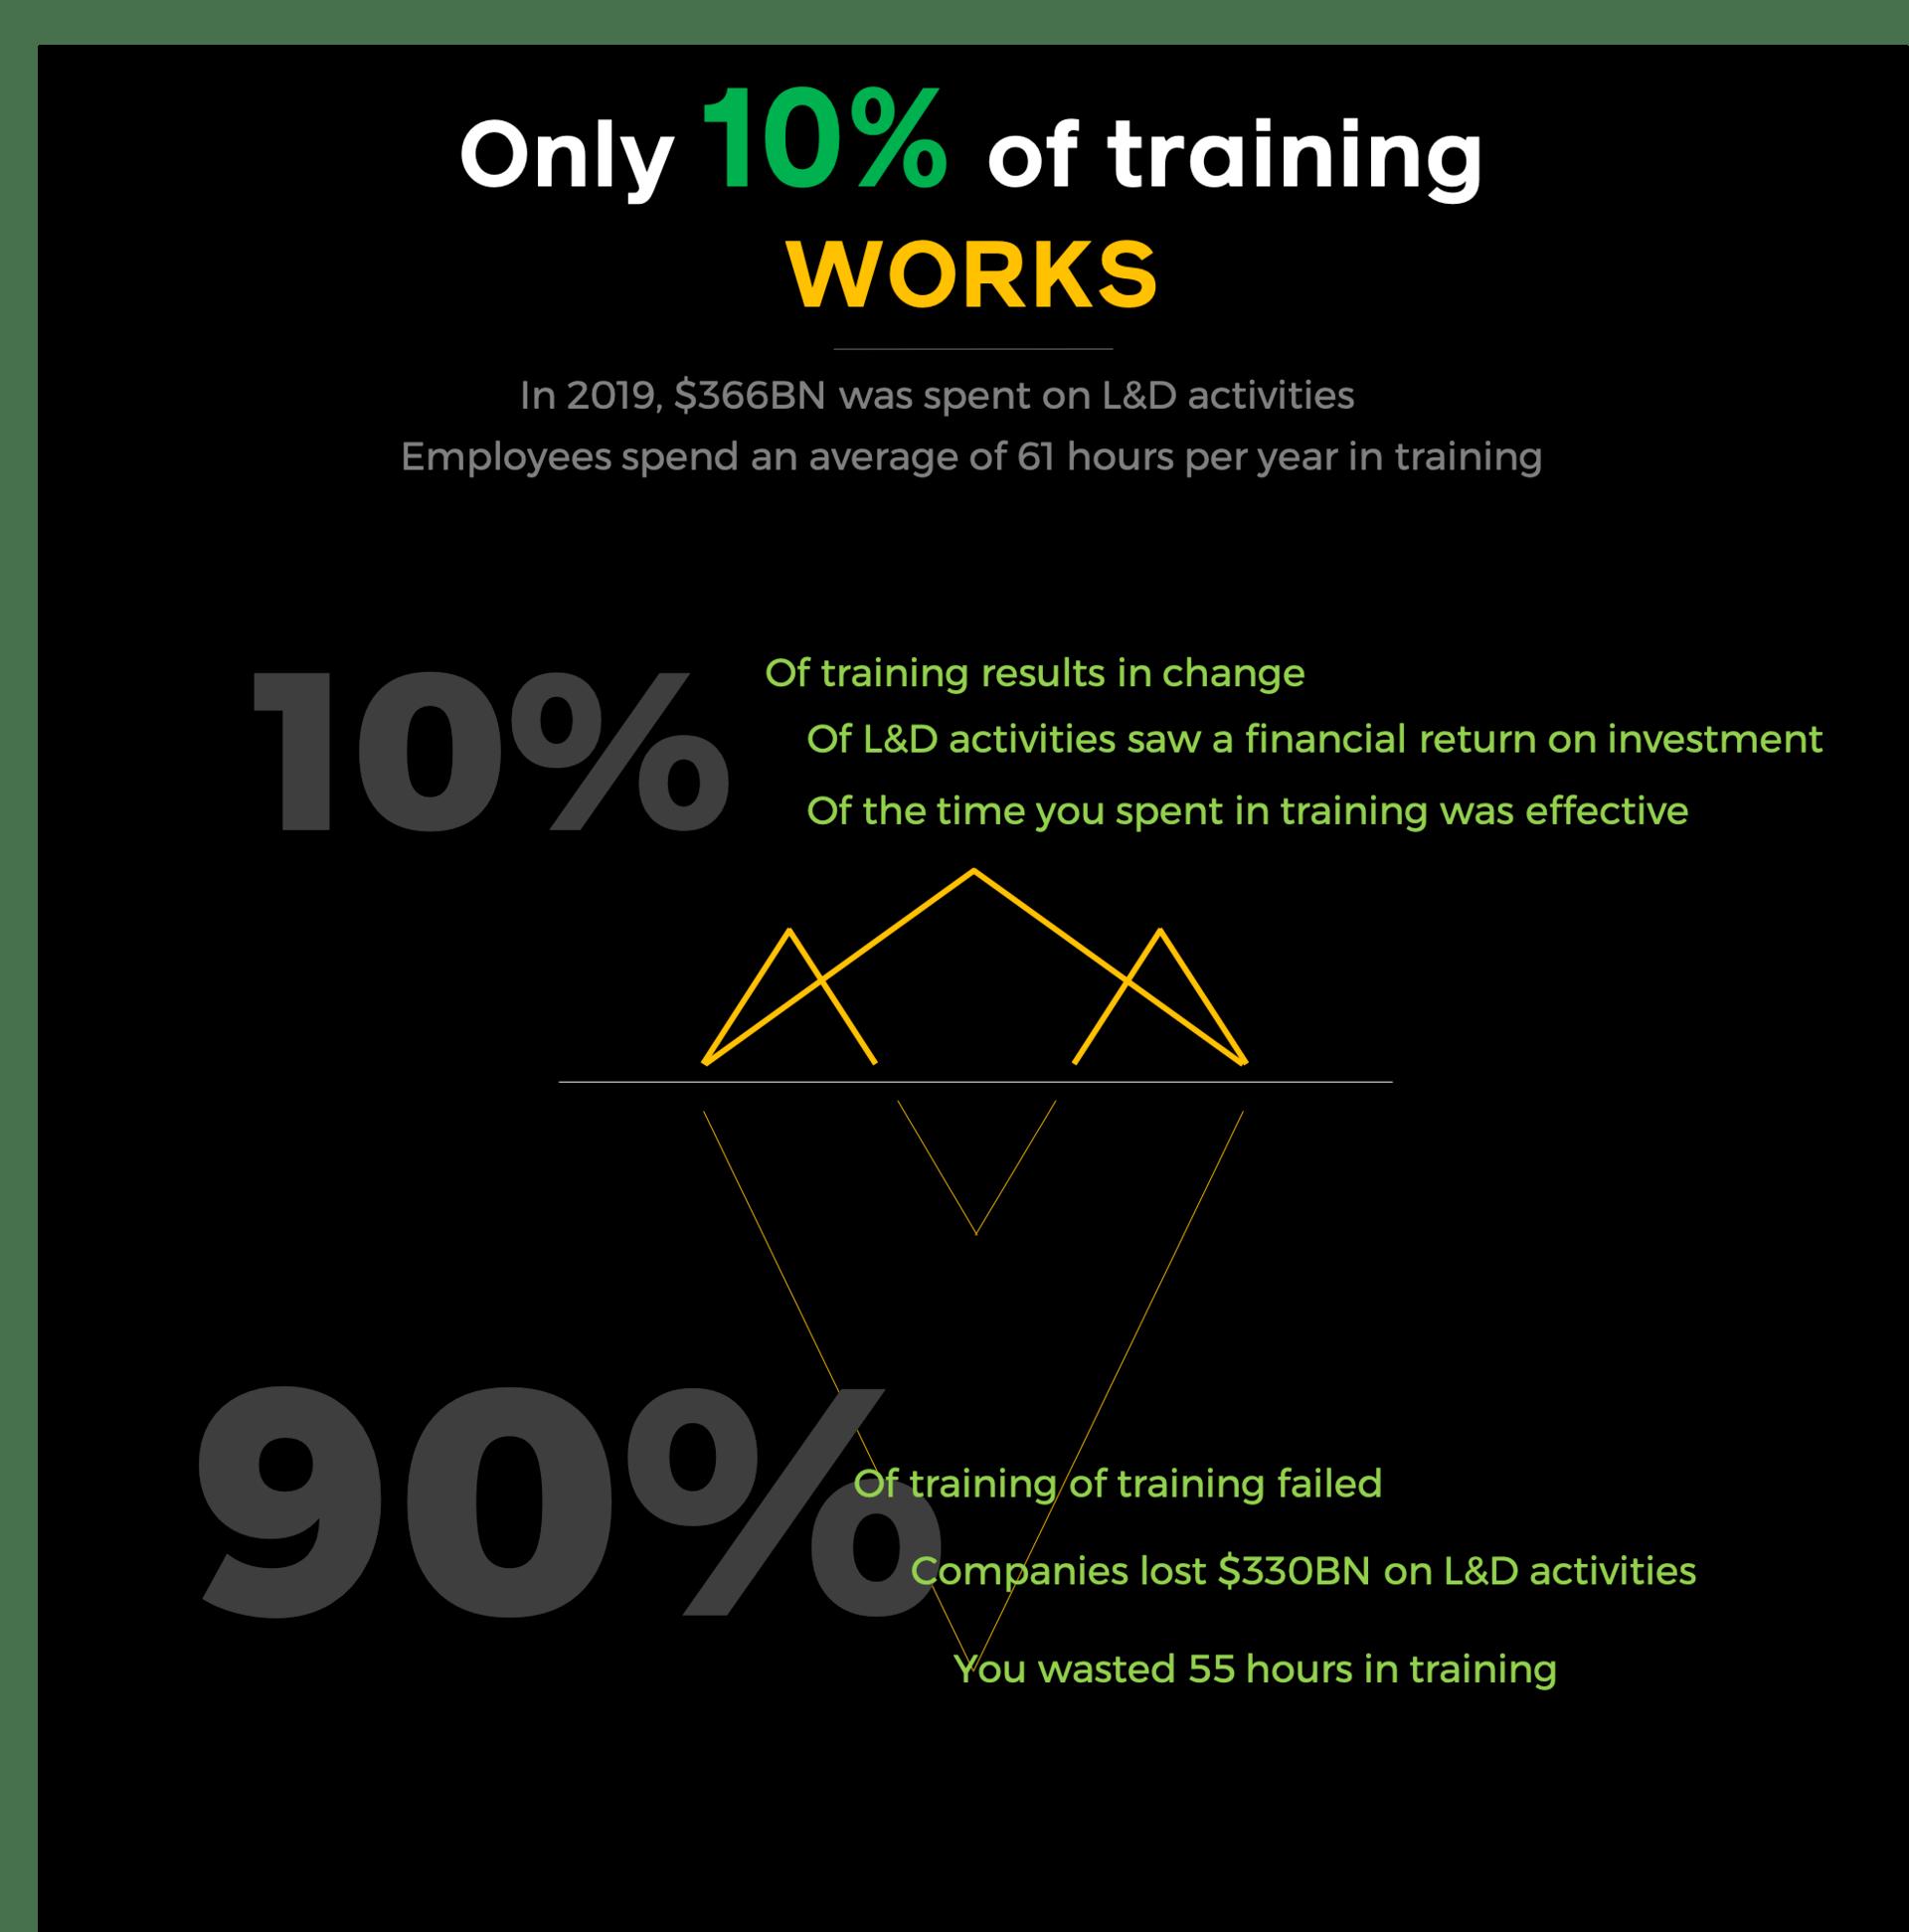 10% of training works